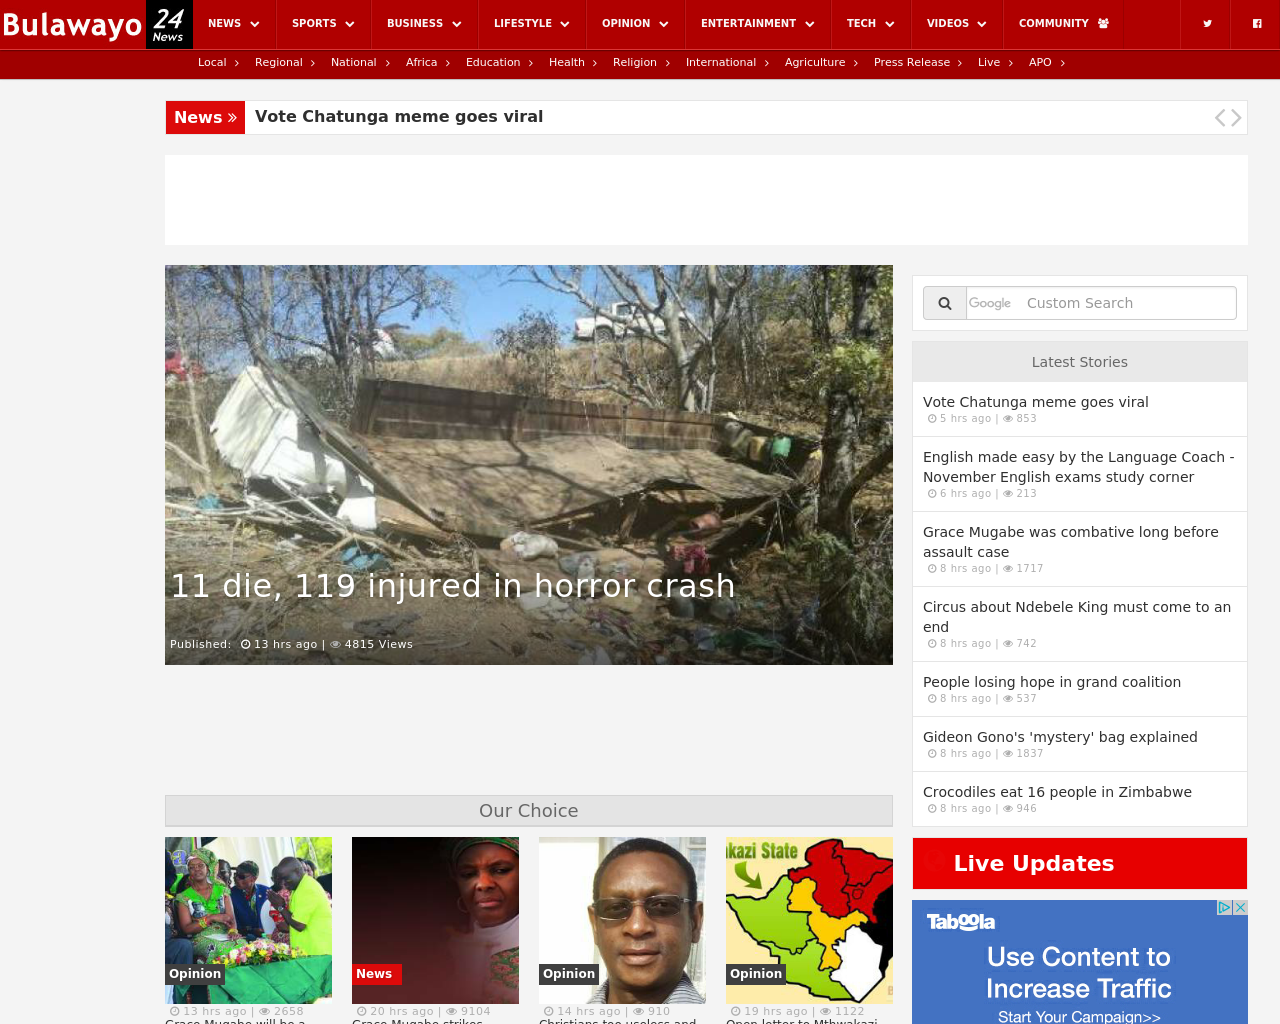 Bulawayo24-News-Advertising-Reviews-Pricing